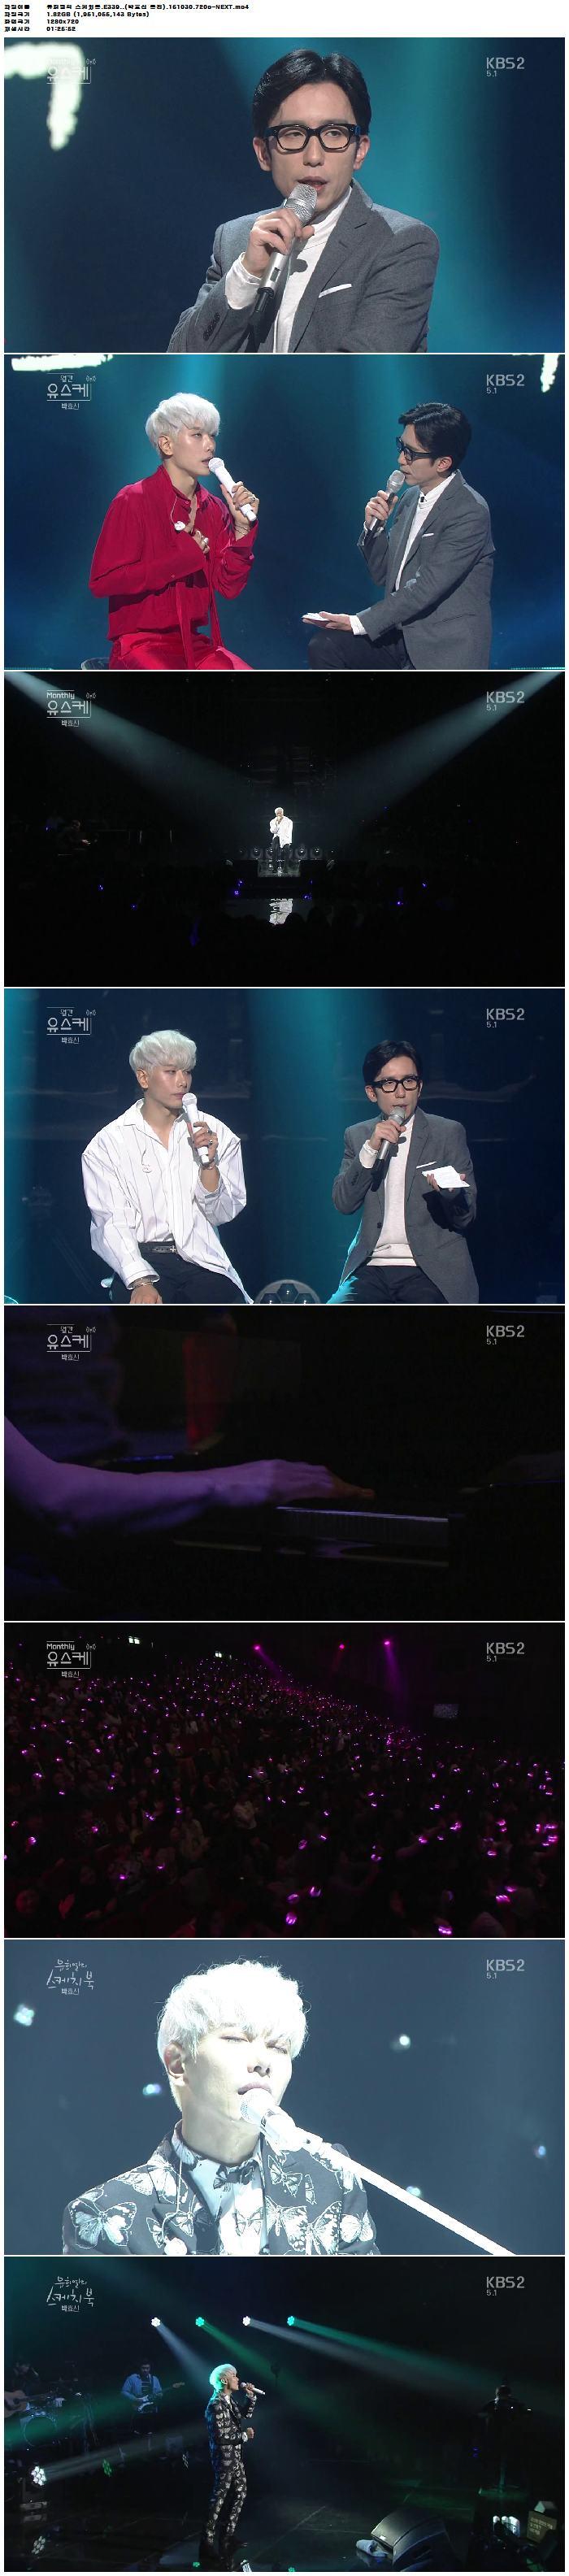 [ENG SUBS] 161030 Park Hyo Shin Yoo Hee Yeol's